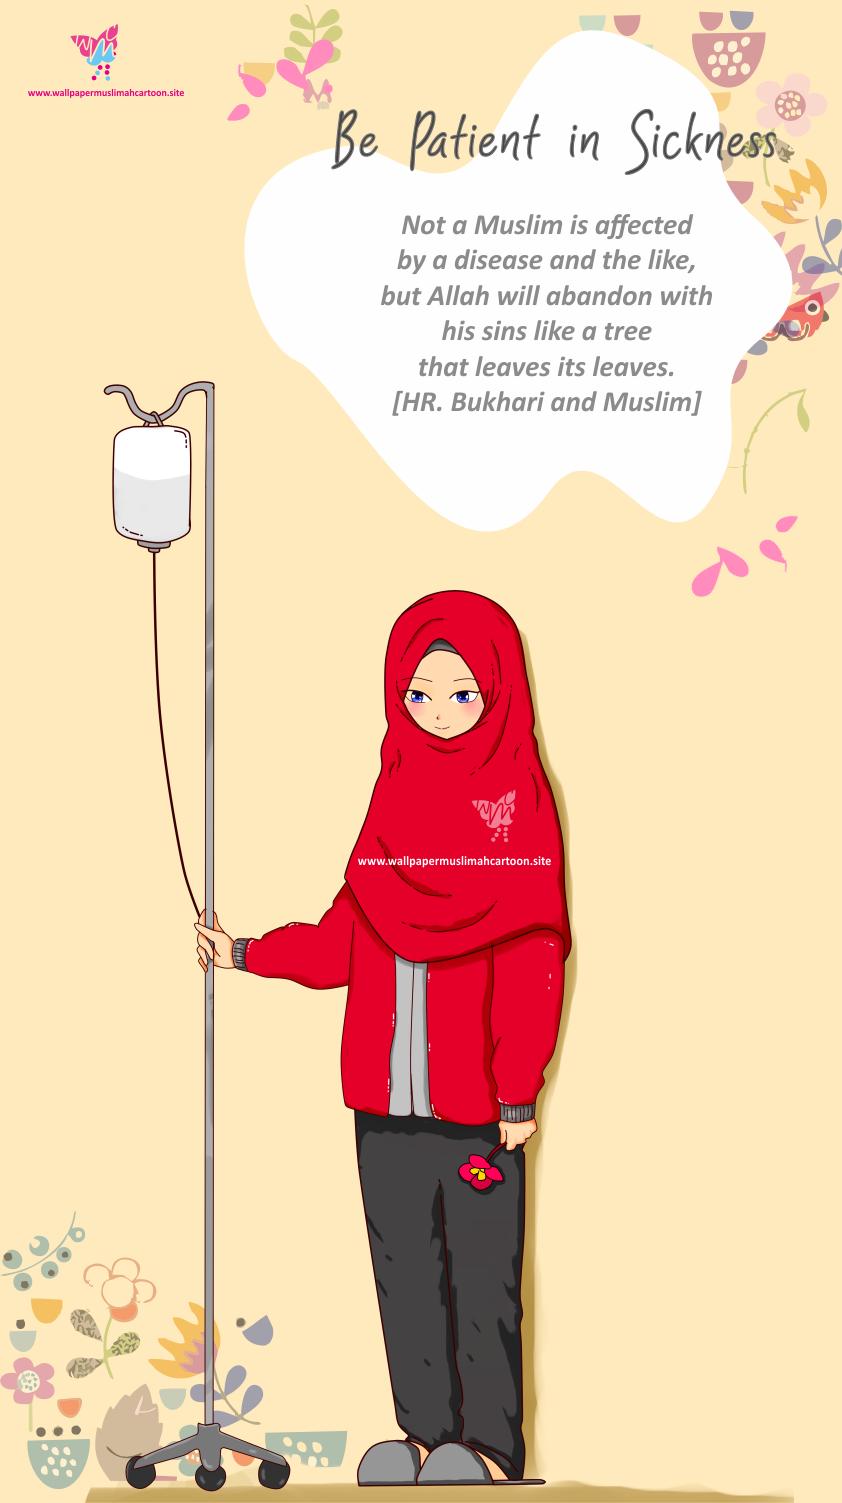 1 Wallpaper Muslim Cartoon Girl Sickness